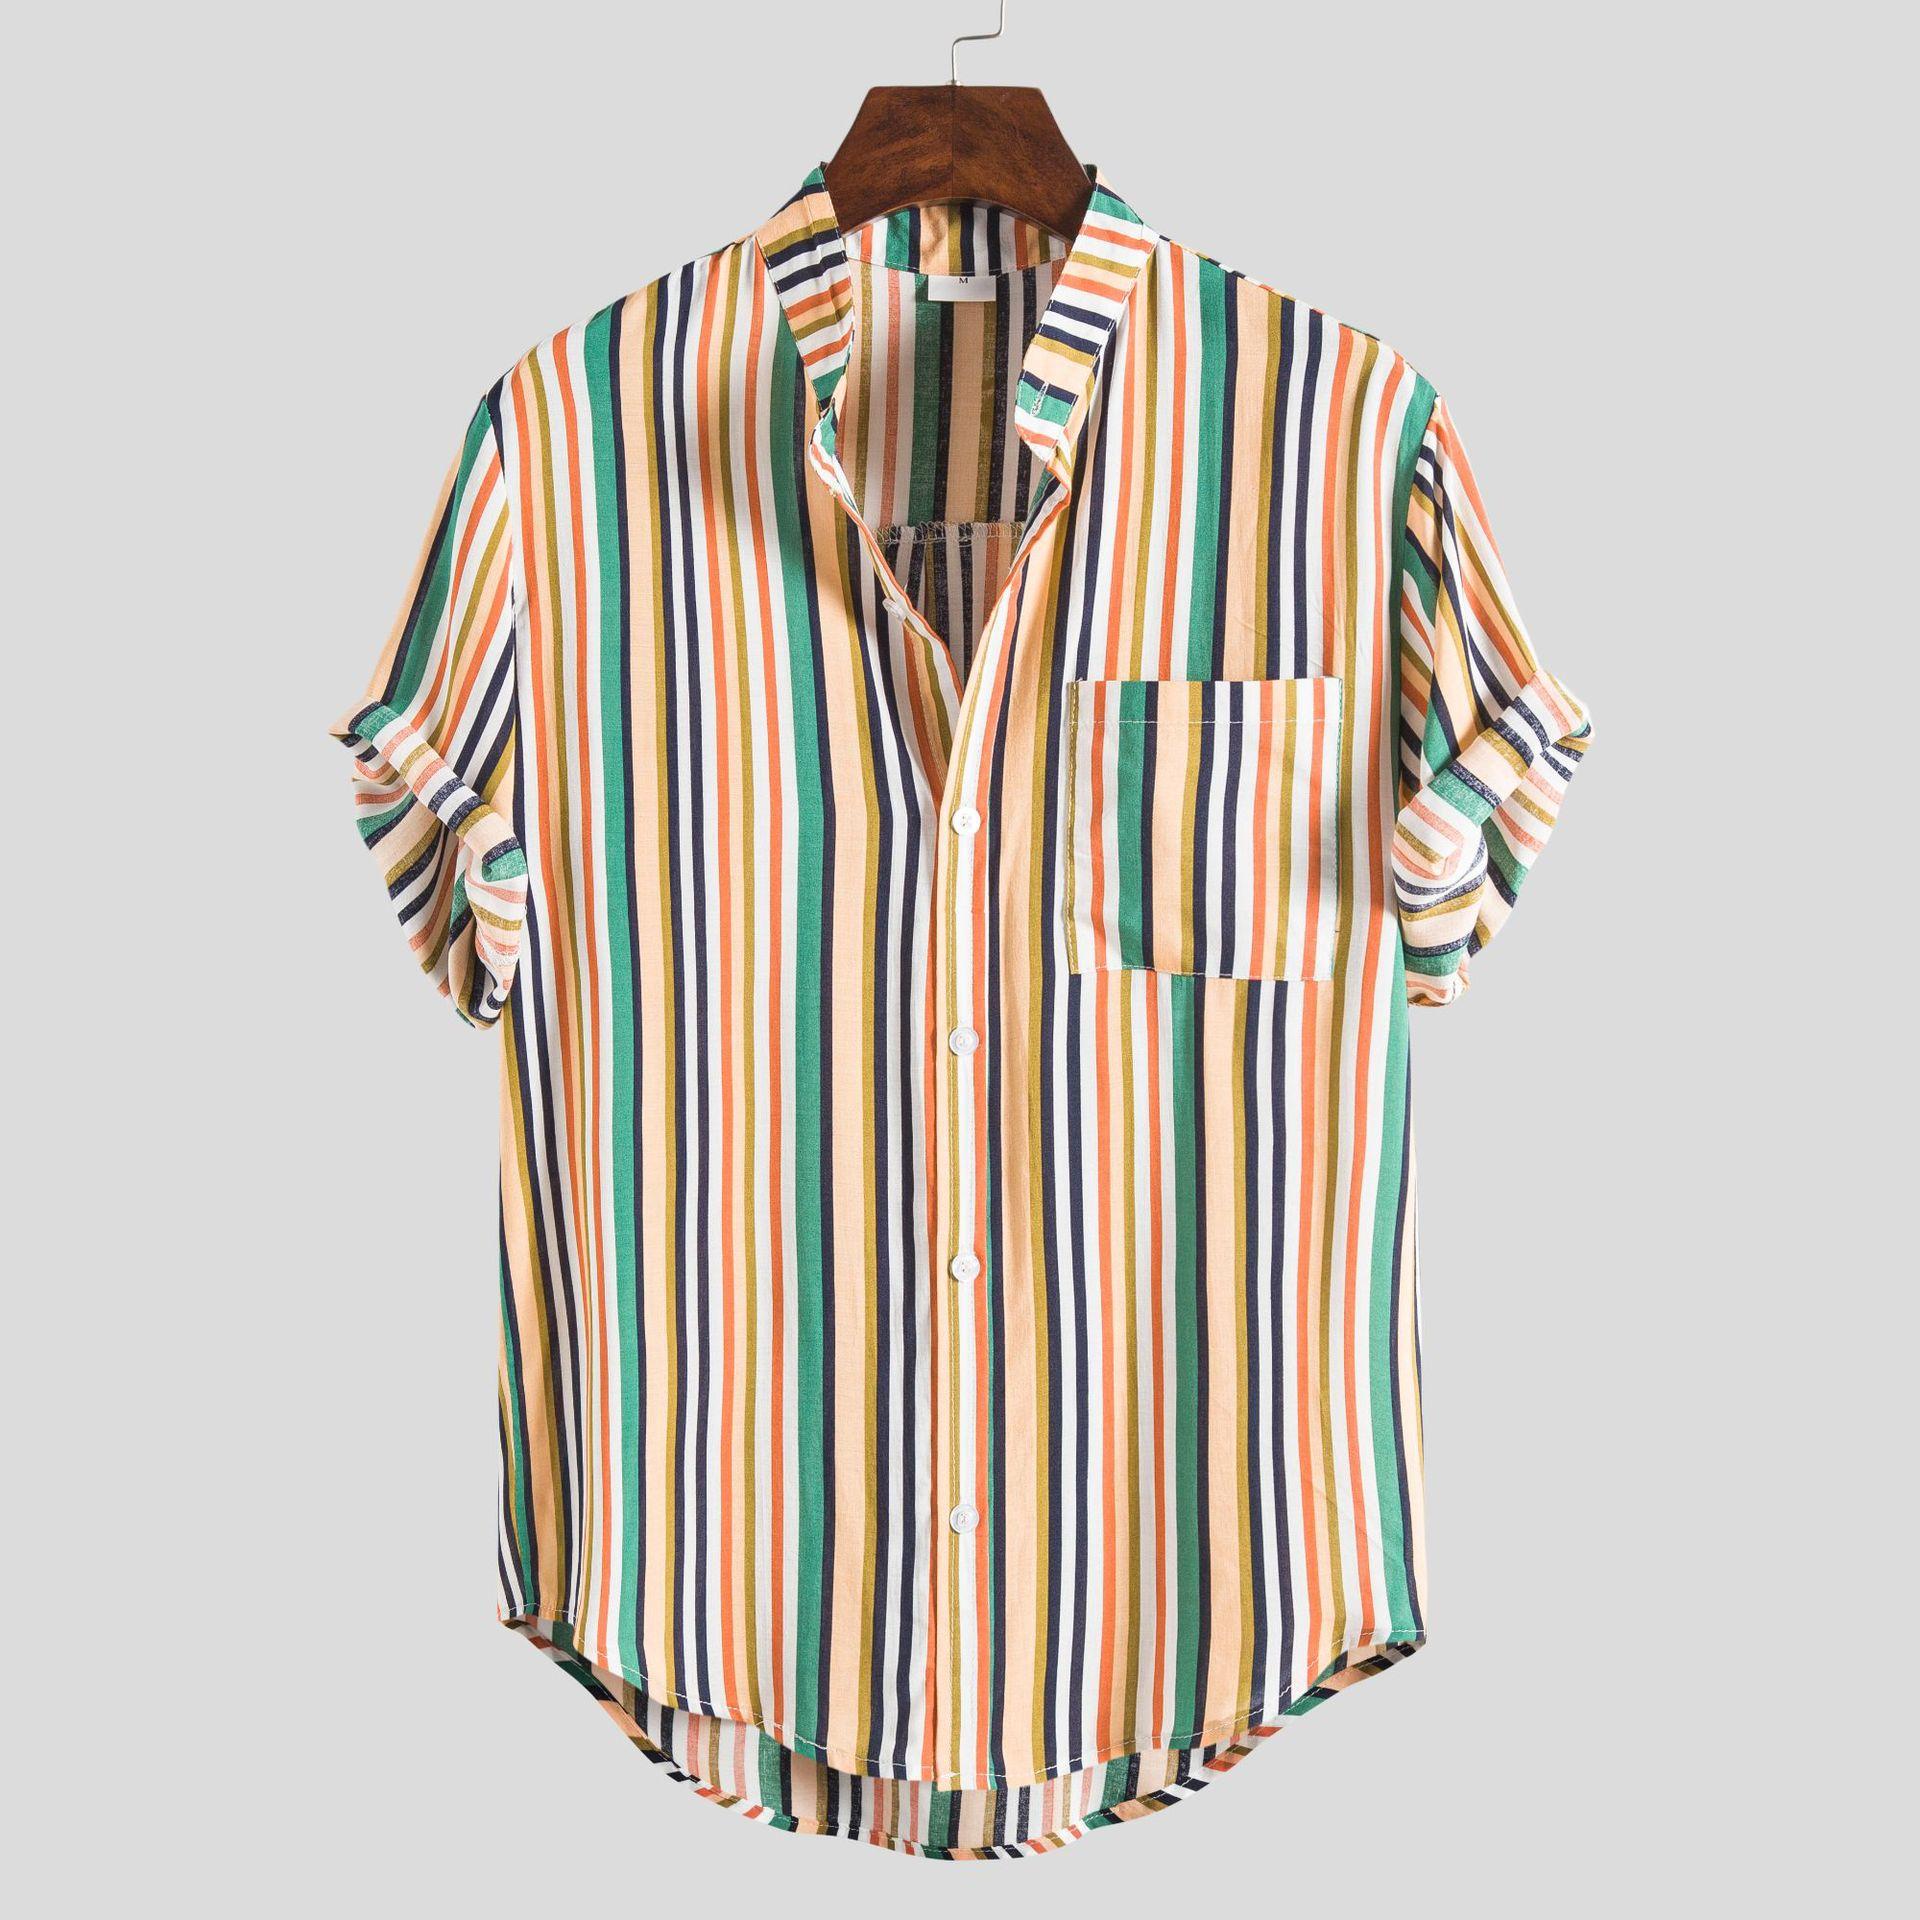 2020 National Style Short-sleeved Shirt Striped Slim Shirt Short-sleeved Shirt Male